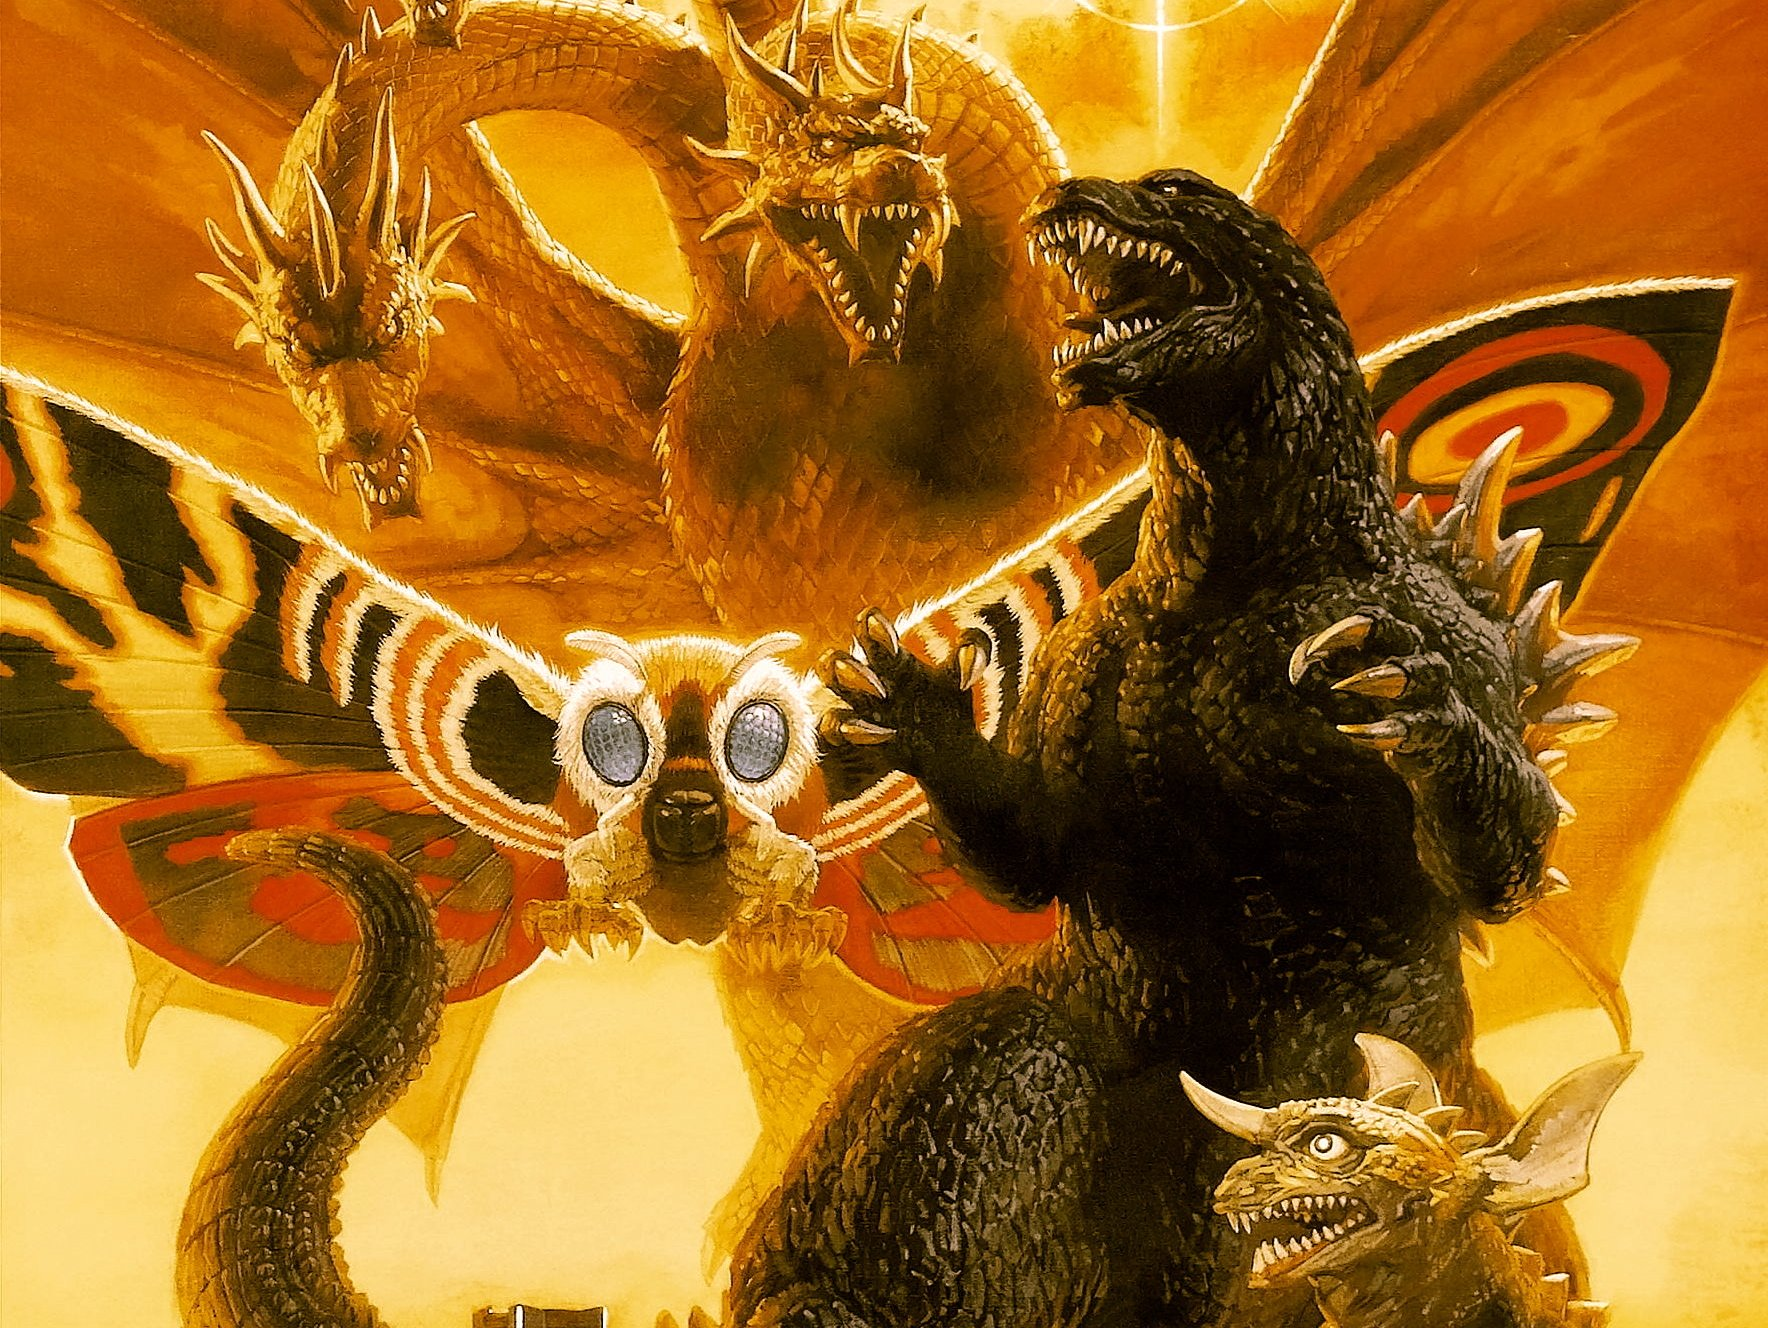 Godzilla vs King Ghidorah Wallpaper and Background Image 1768x1328